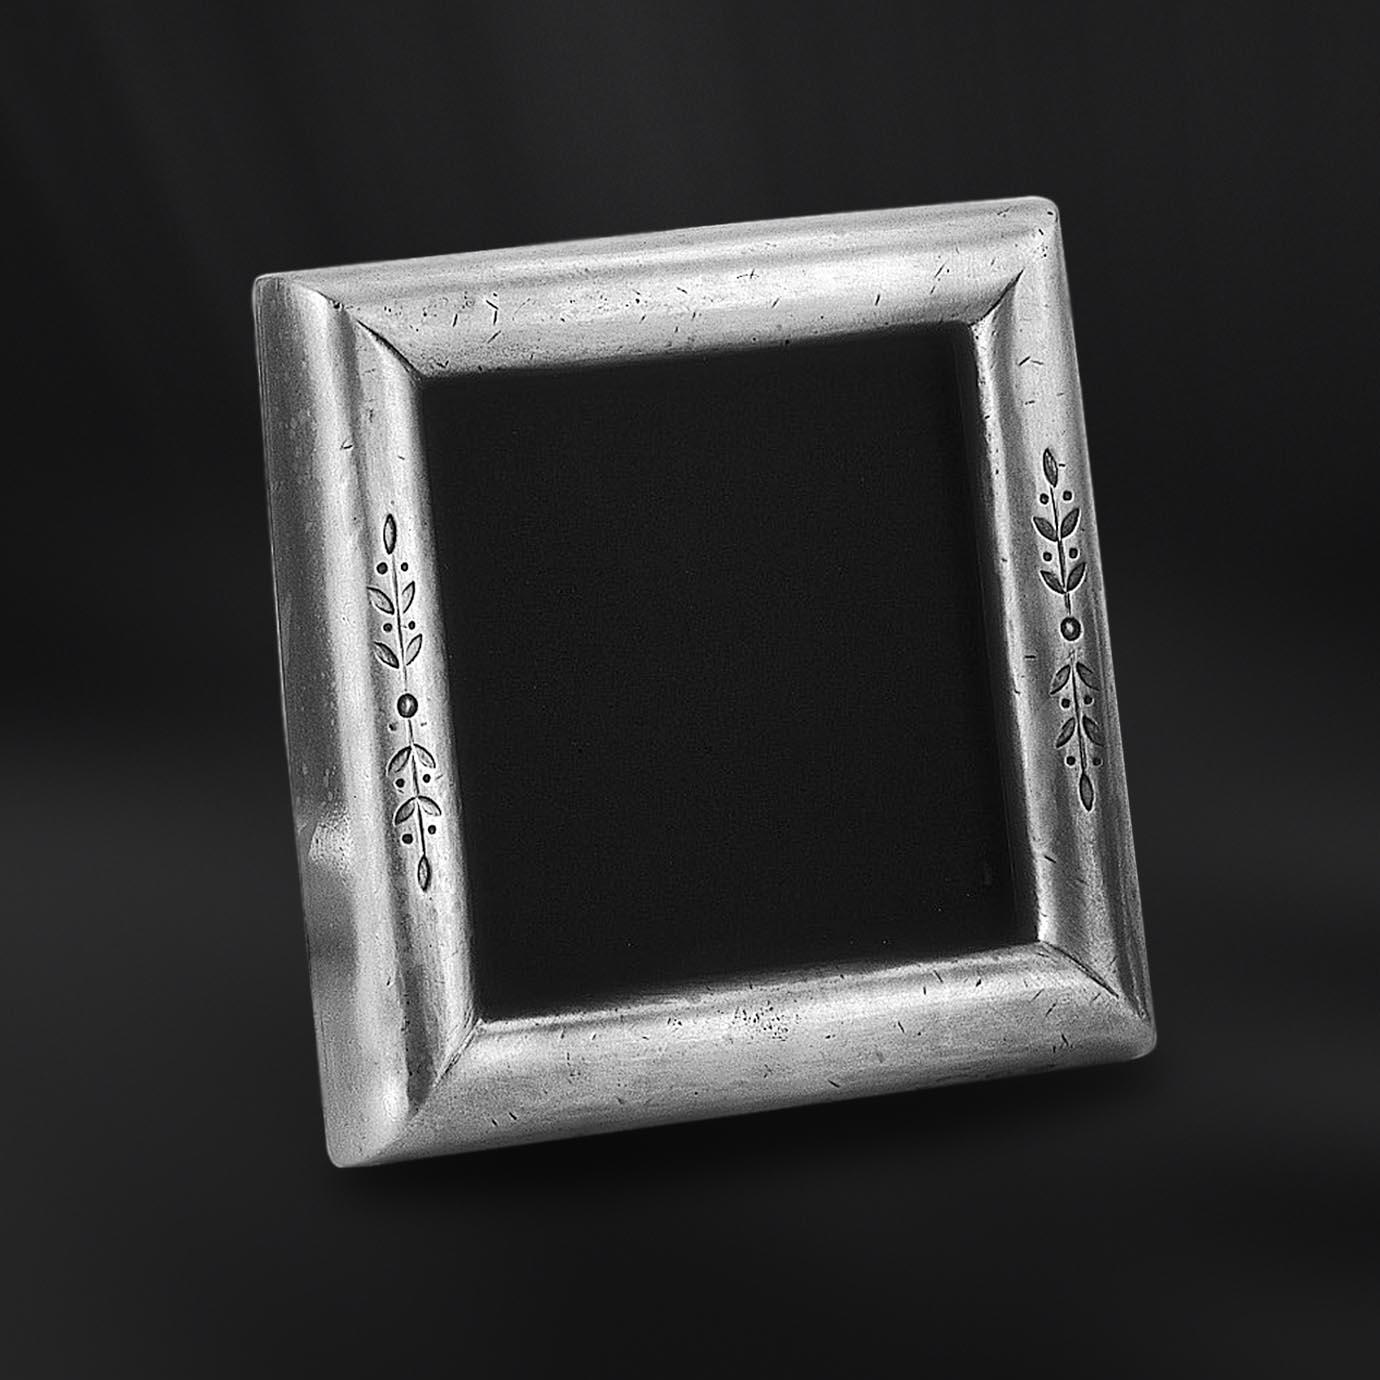 Viereckiger Bilderrahmen aus Zinn 13x13 - La Bottega del Peltro